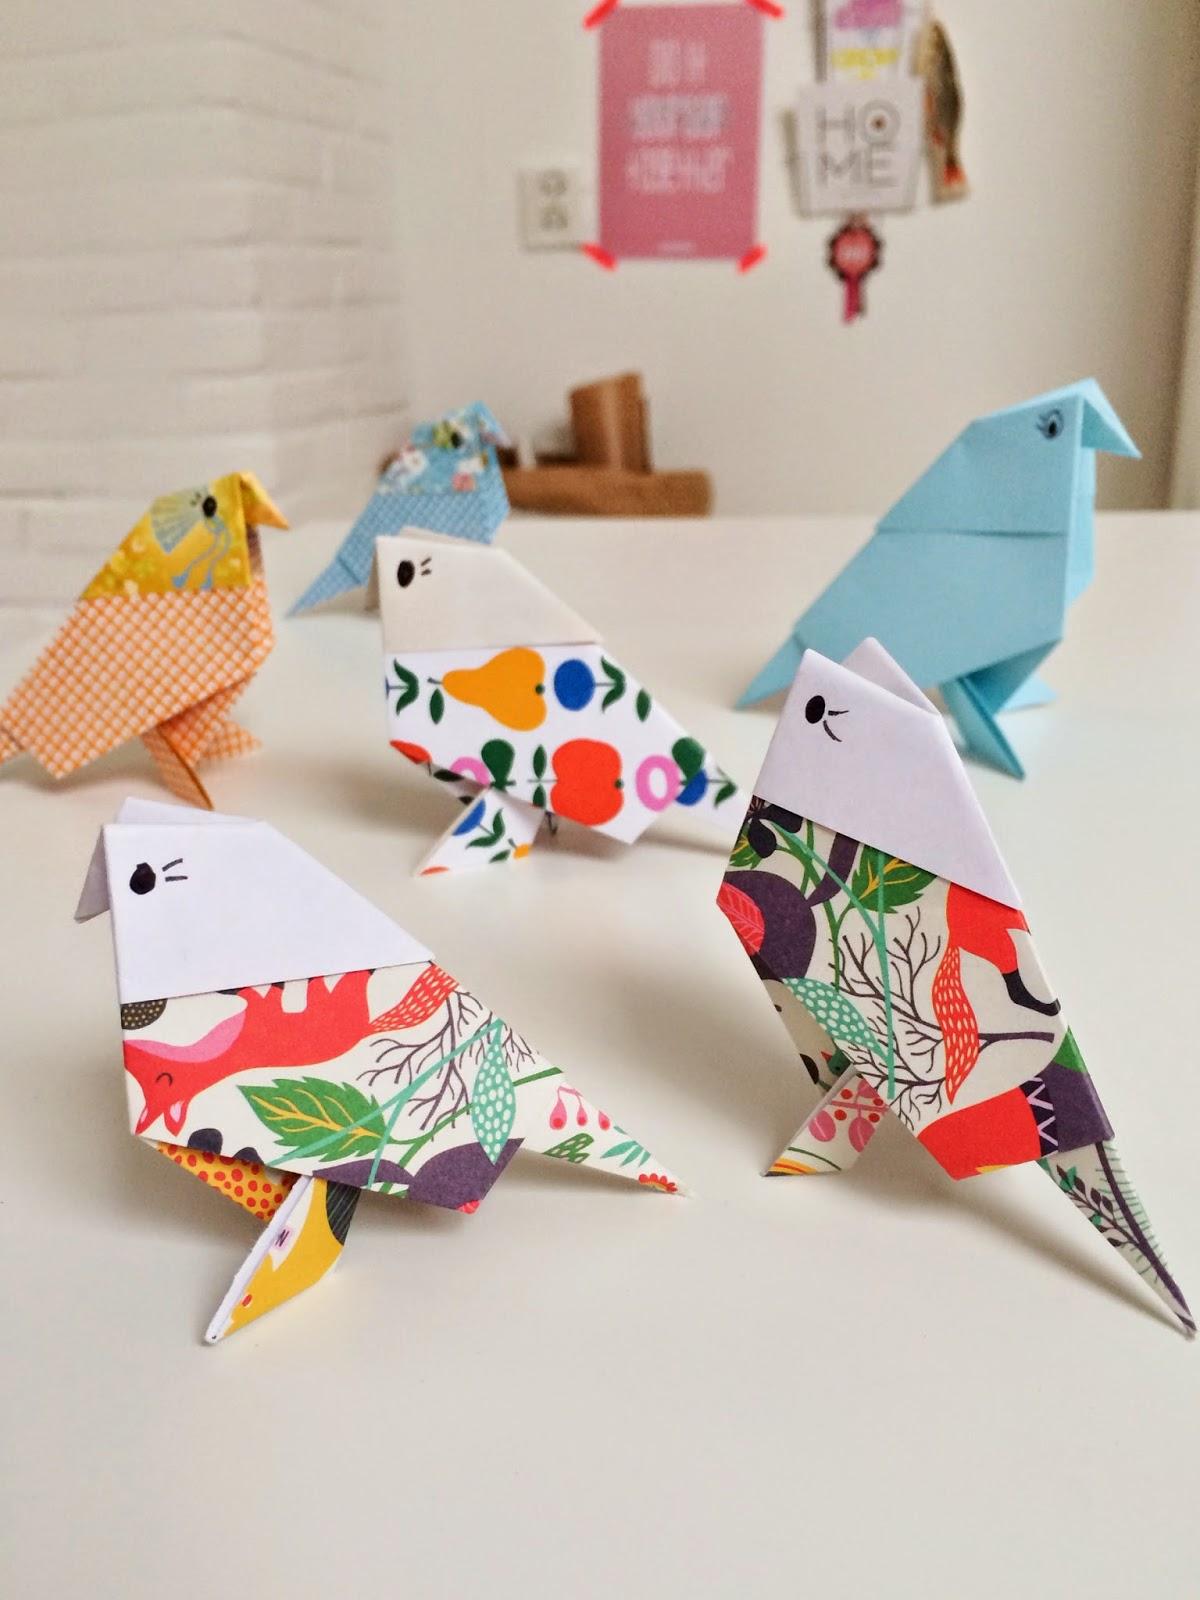 Origami birds fun crafts kids jeuxipadfo Image collections